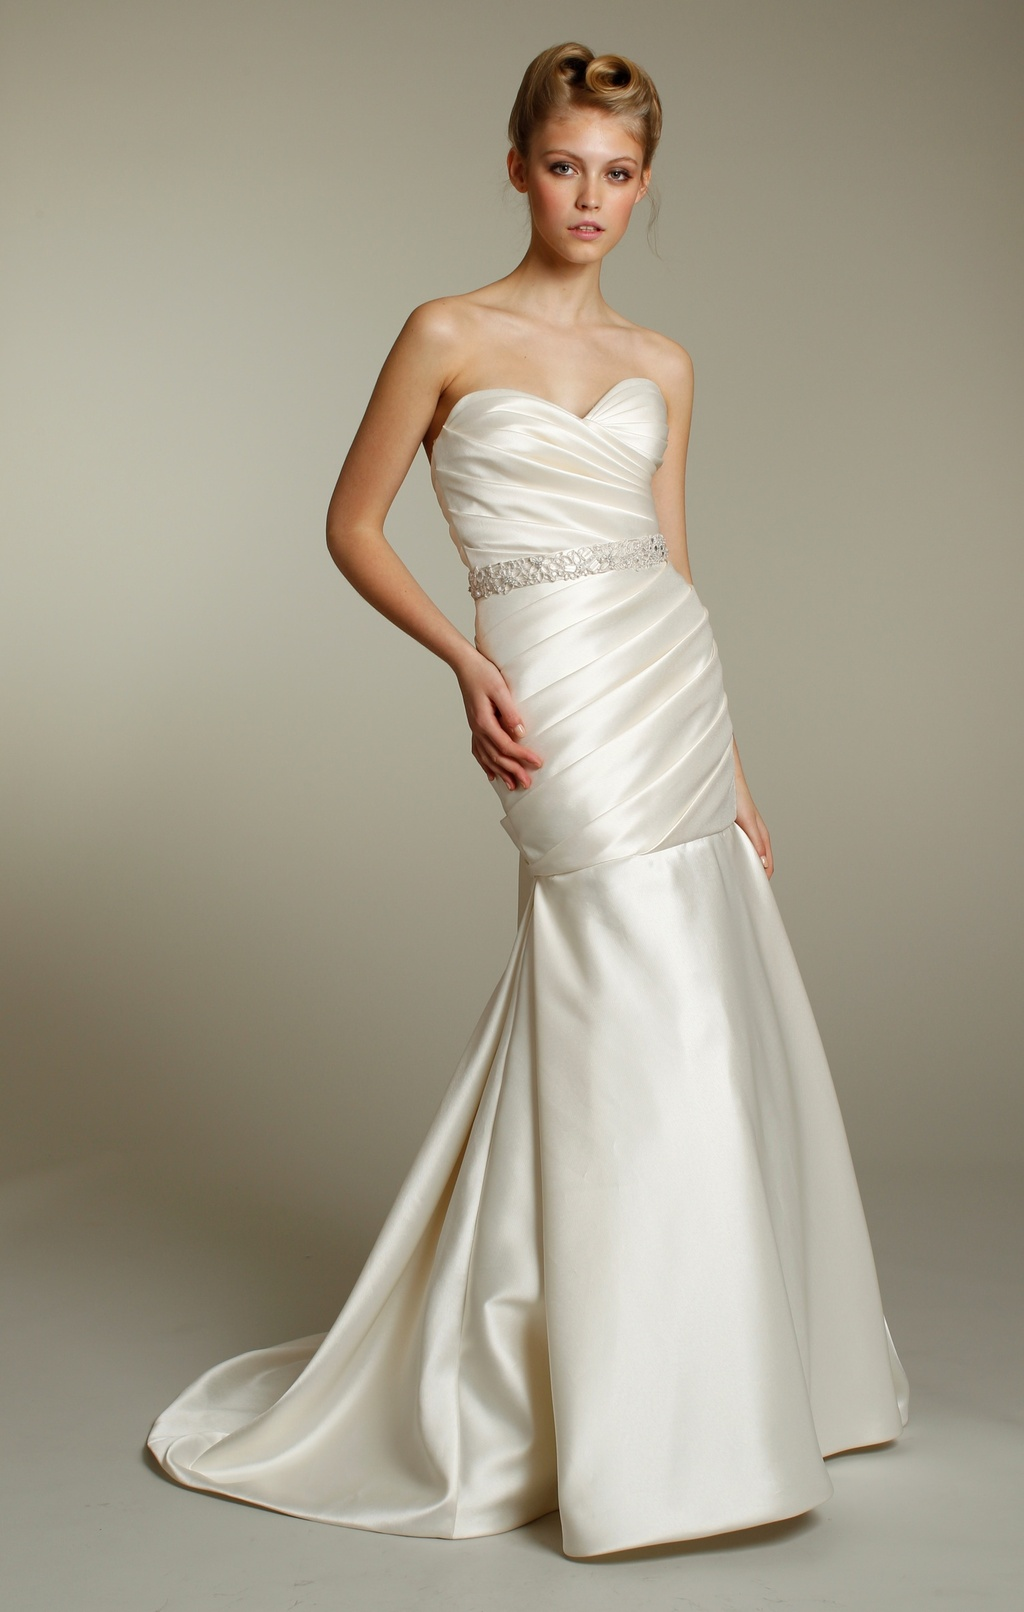 2153-wedding-dress-fall-2011-bridal-gowns-drop-waist-satin-mermaid.full